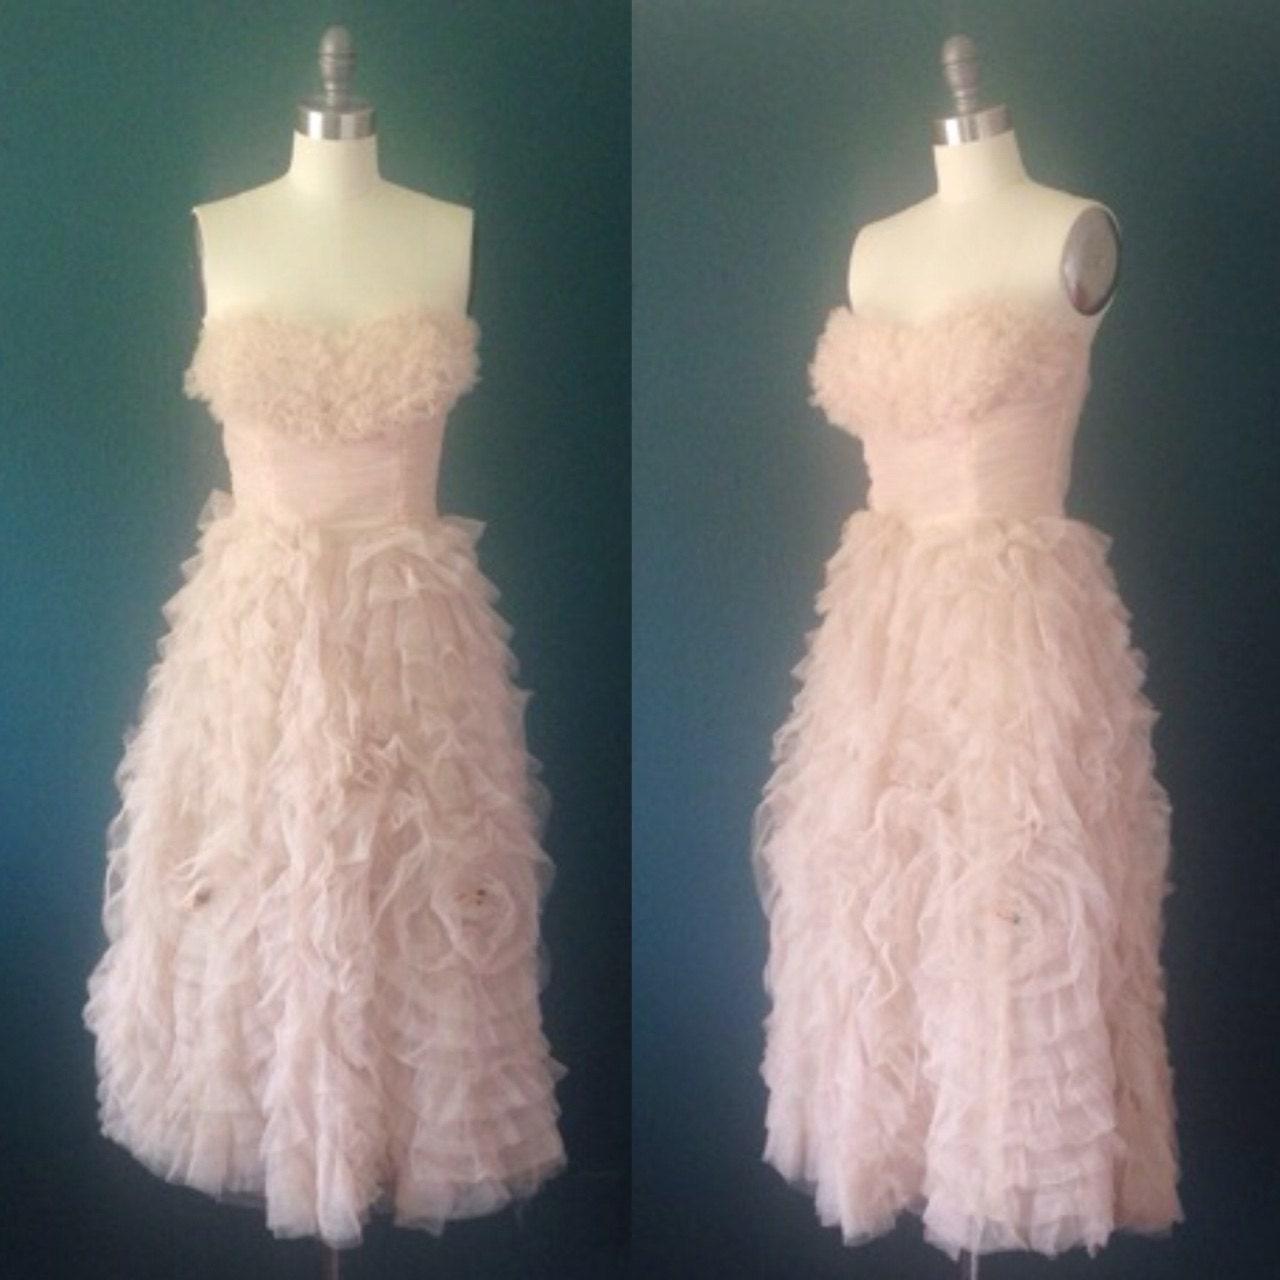 Blush Wedding Dress Petite : Blush dress gown tan tulle wedding